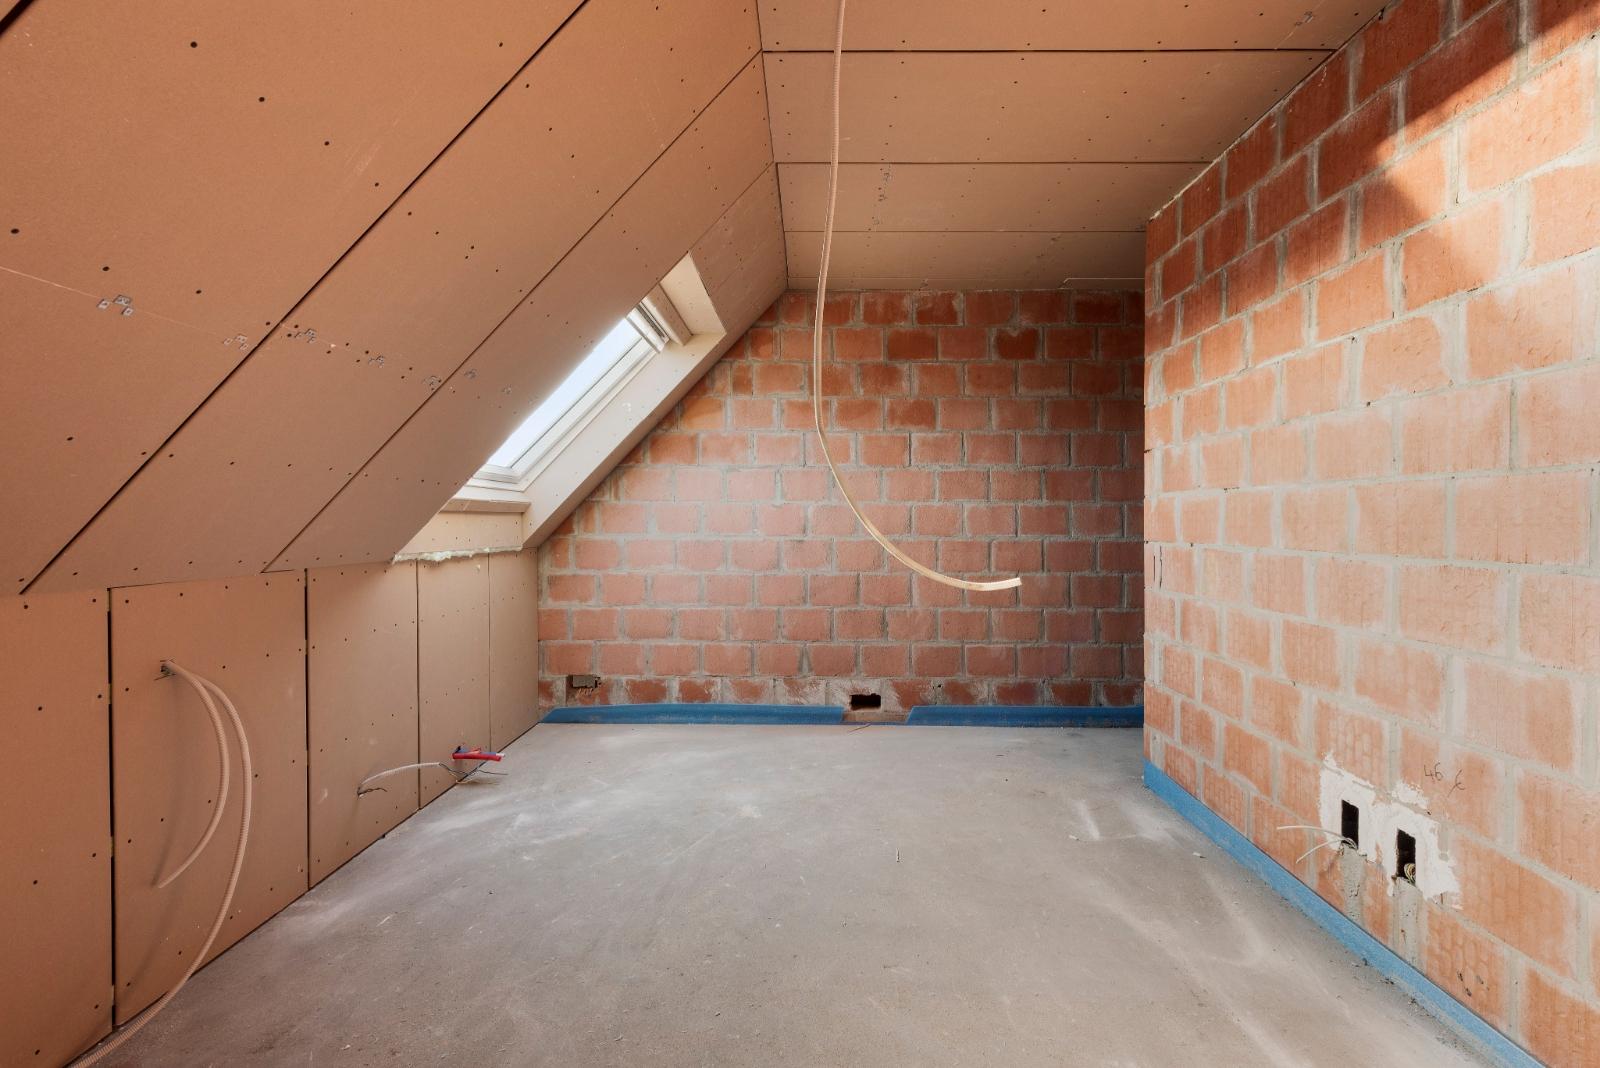 Kwaliteitsvolle nieuwbouwwoning in centrum Leke - 6